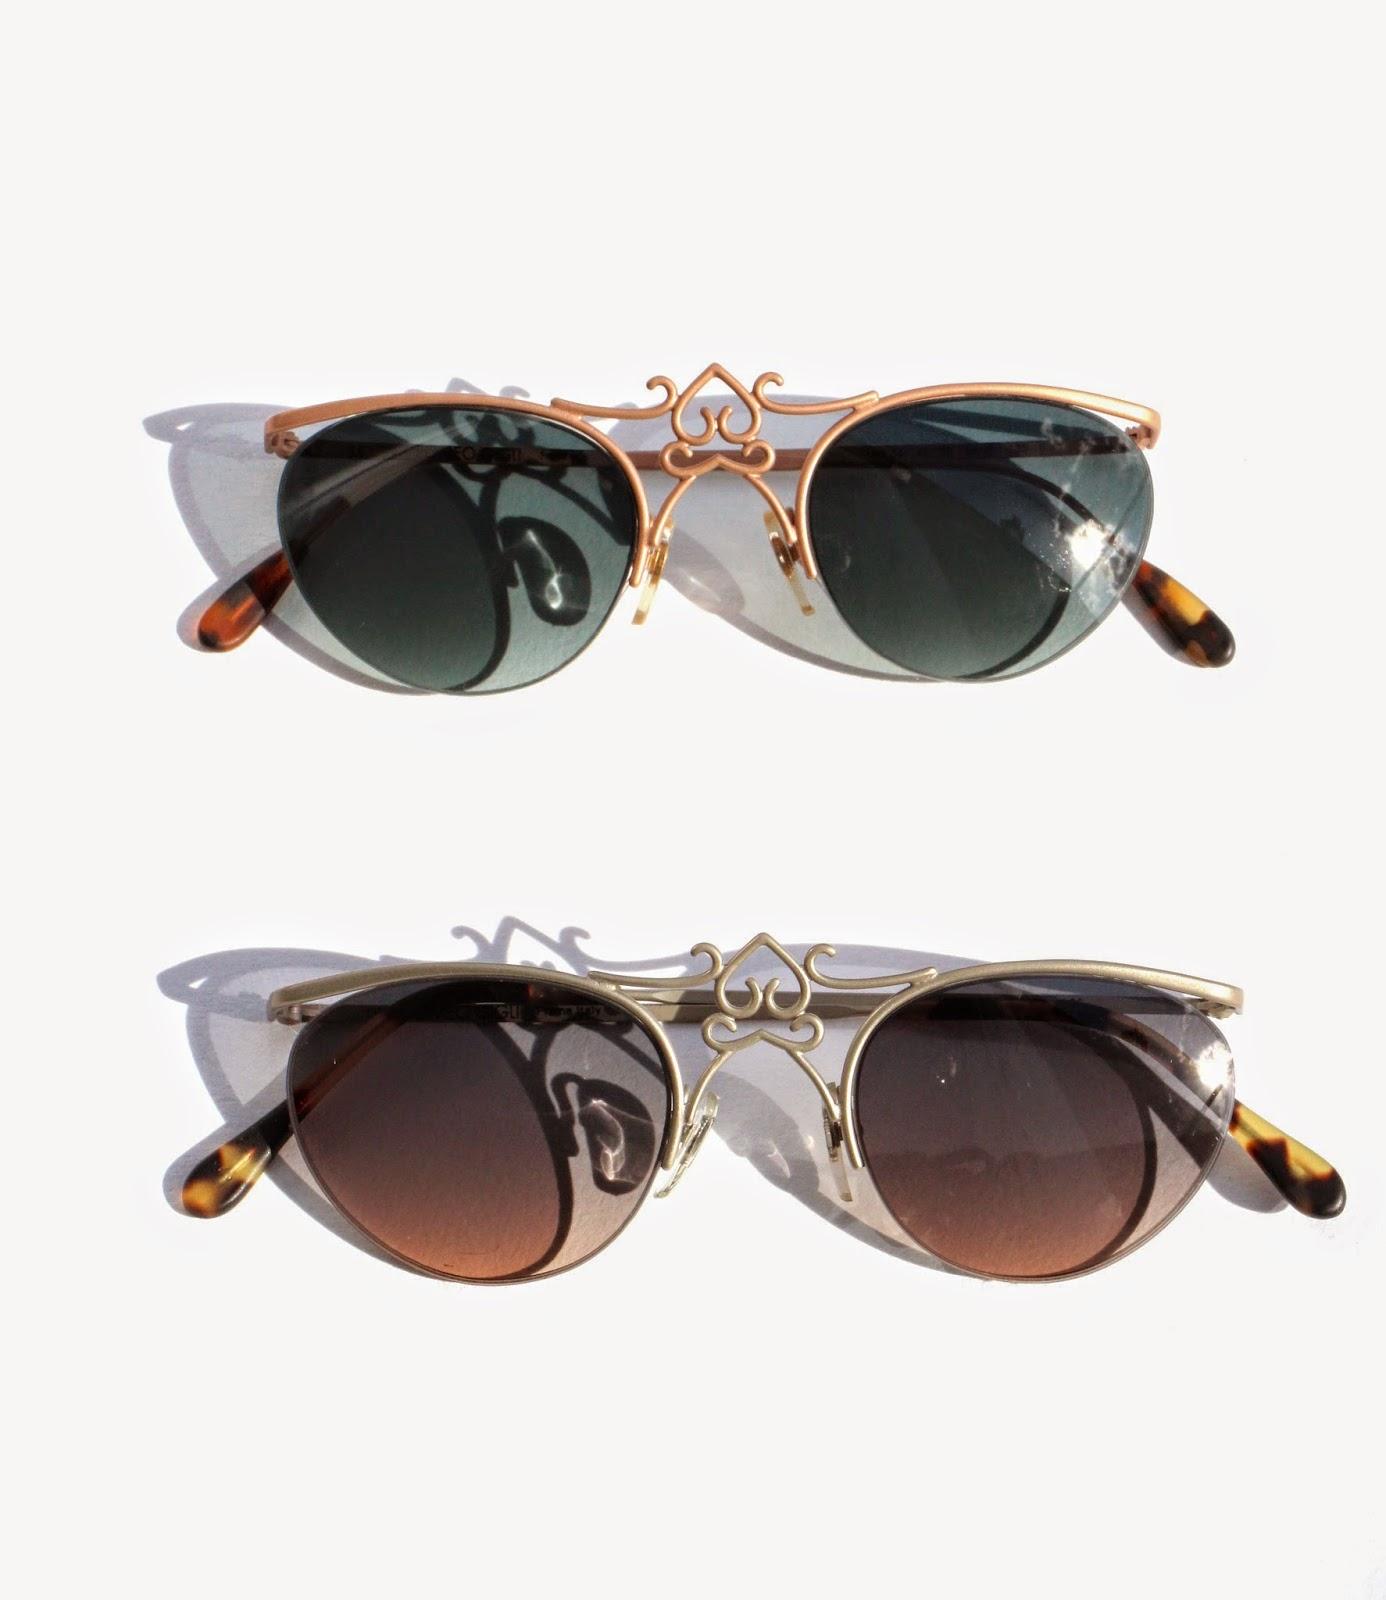 073a008d3bd Romeo Gigli Eyewear Collection - eyewear near me